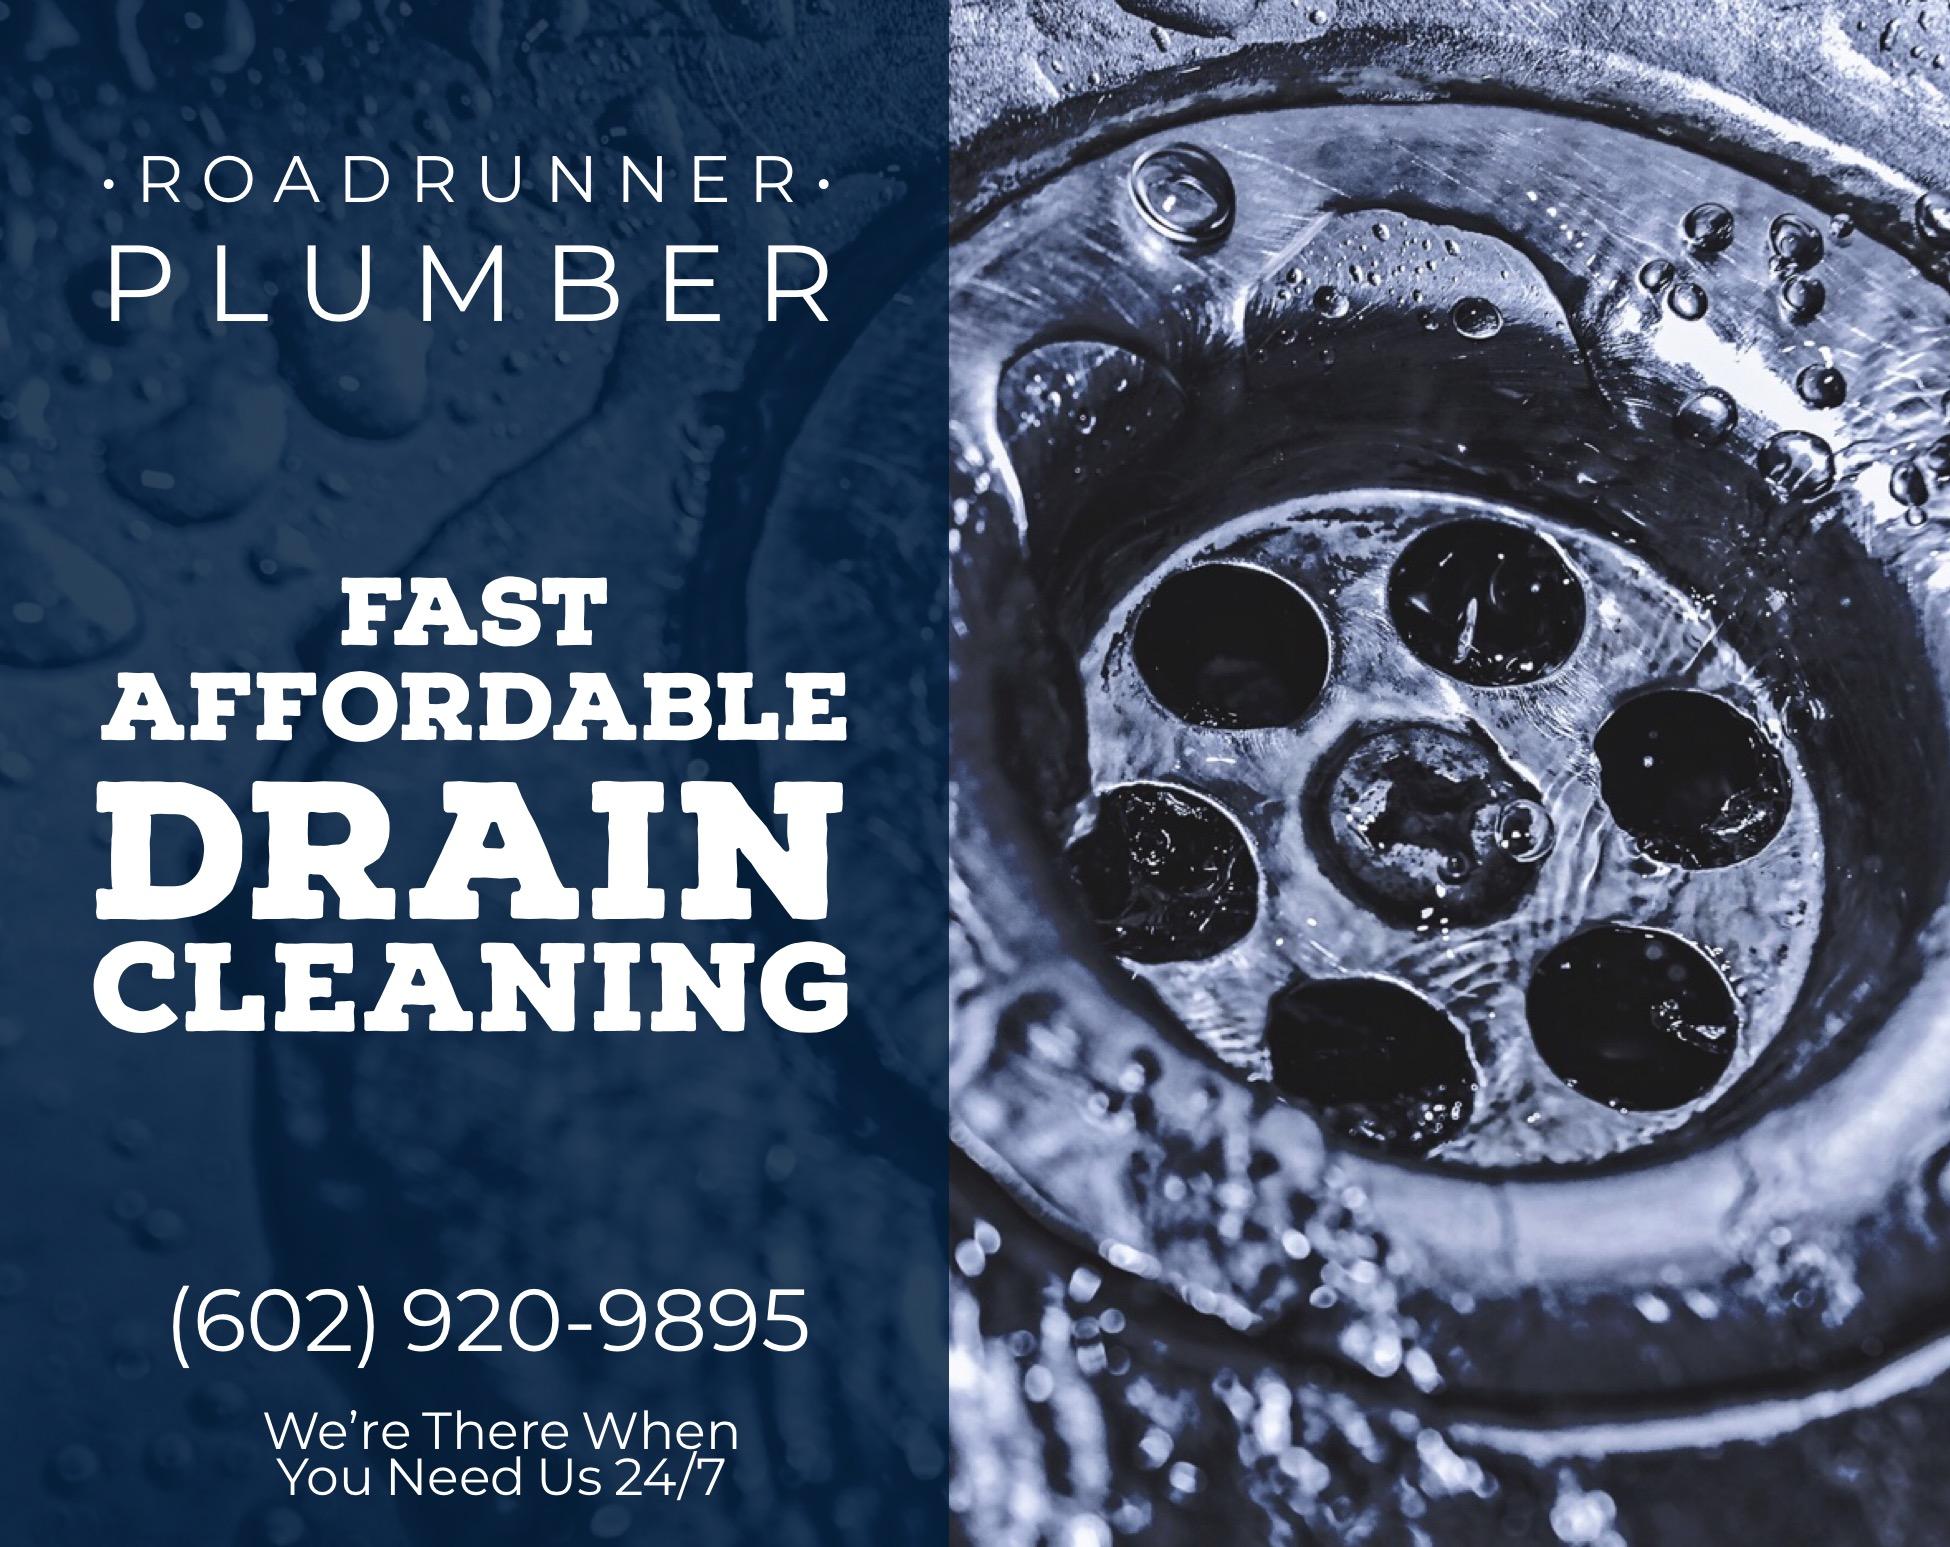 Plumbing ★ Drain Cleaning ★ Plumber